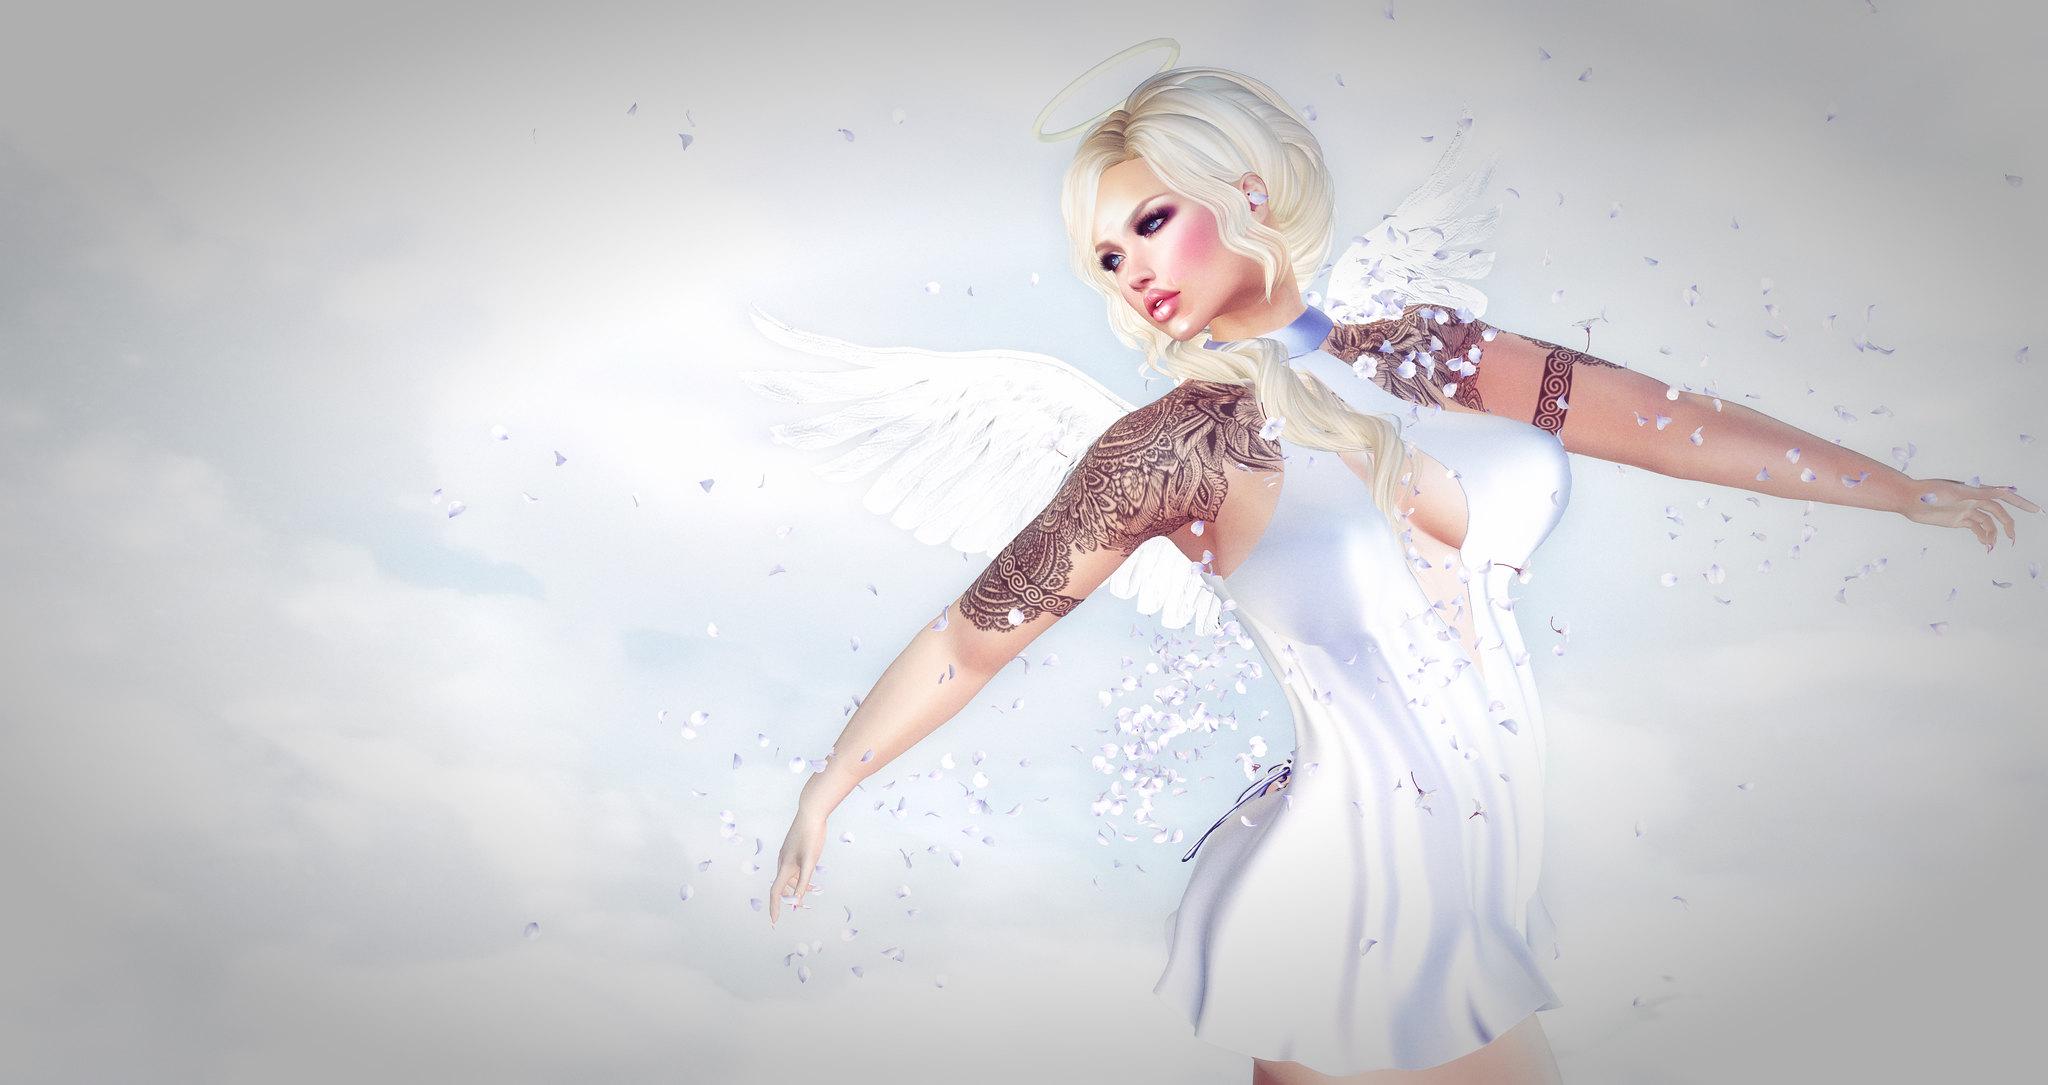 I told you I am an angel